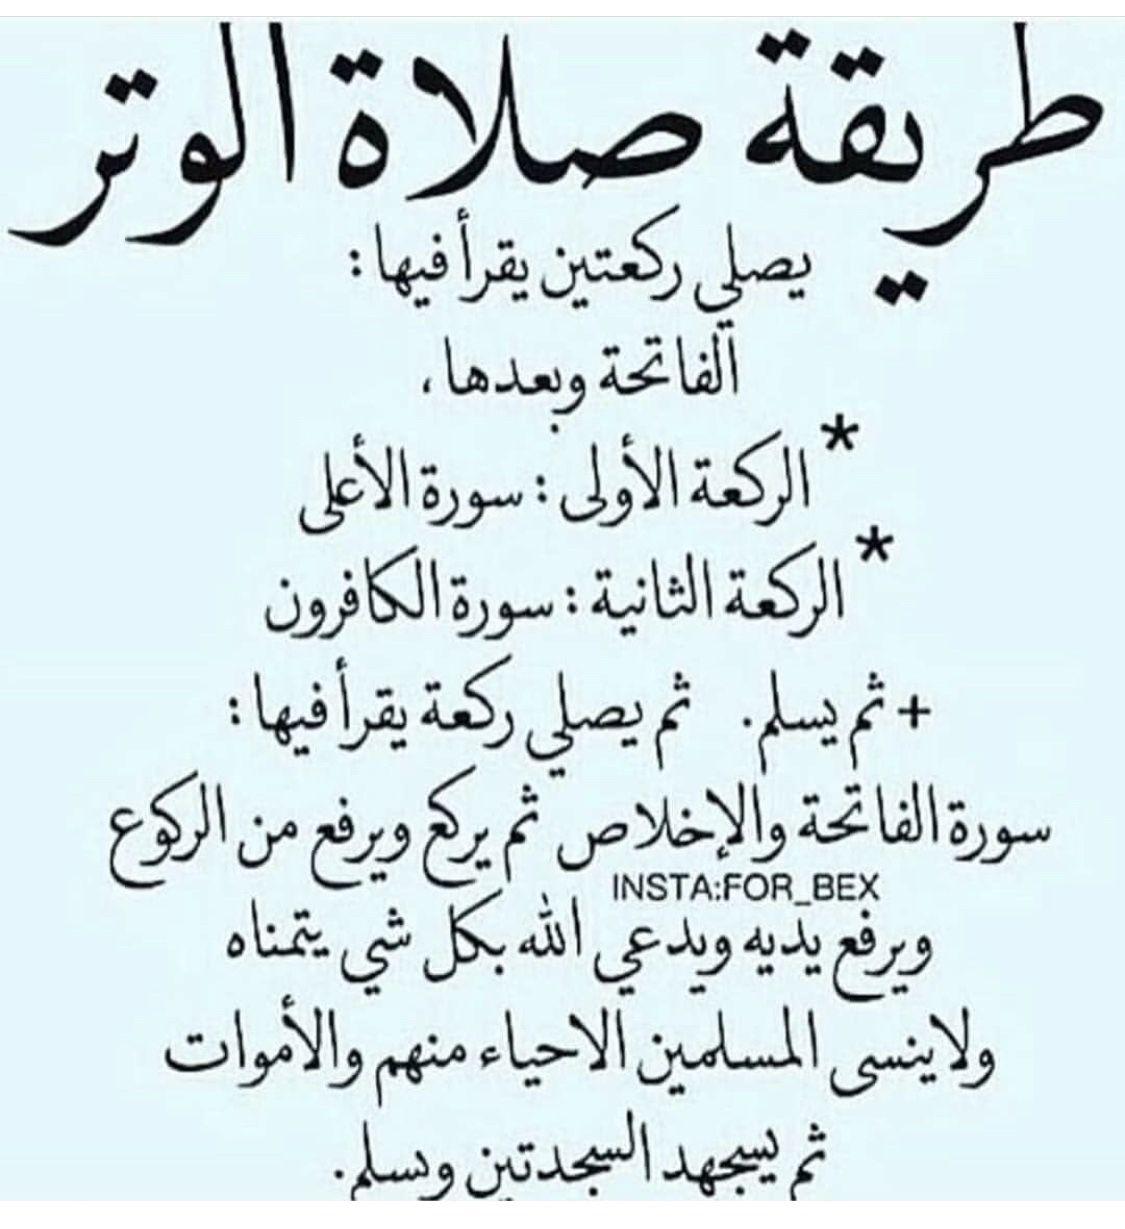 Pin By Nemo Elraies On أذكار ودعاء Islam Beliefs Islam Facts Islamic Phrases